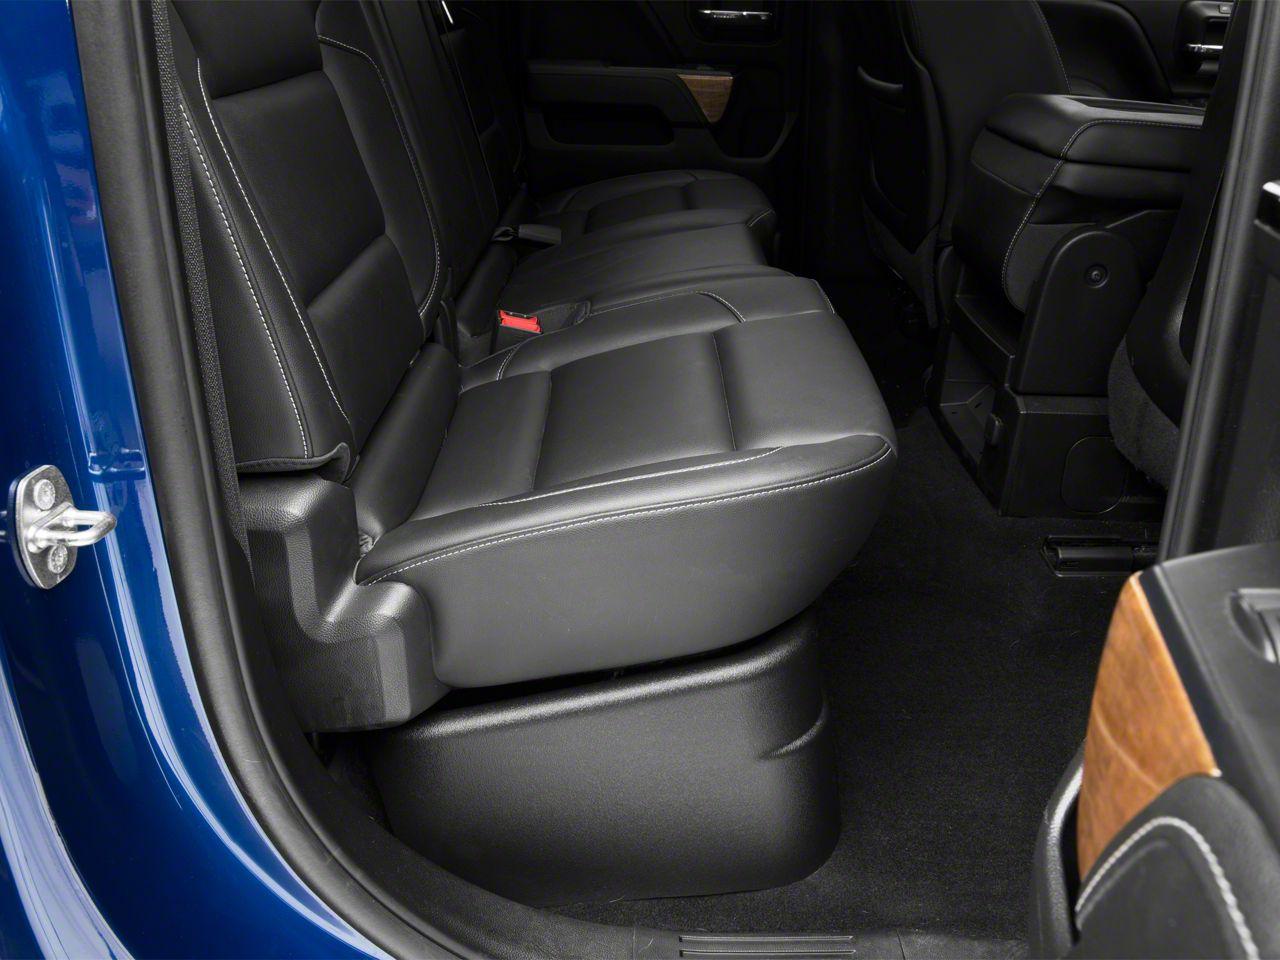 Husky GearBox Under Seat Storage Box (14-18 Silverado 1500 Crew Cab)